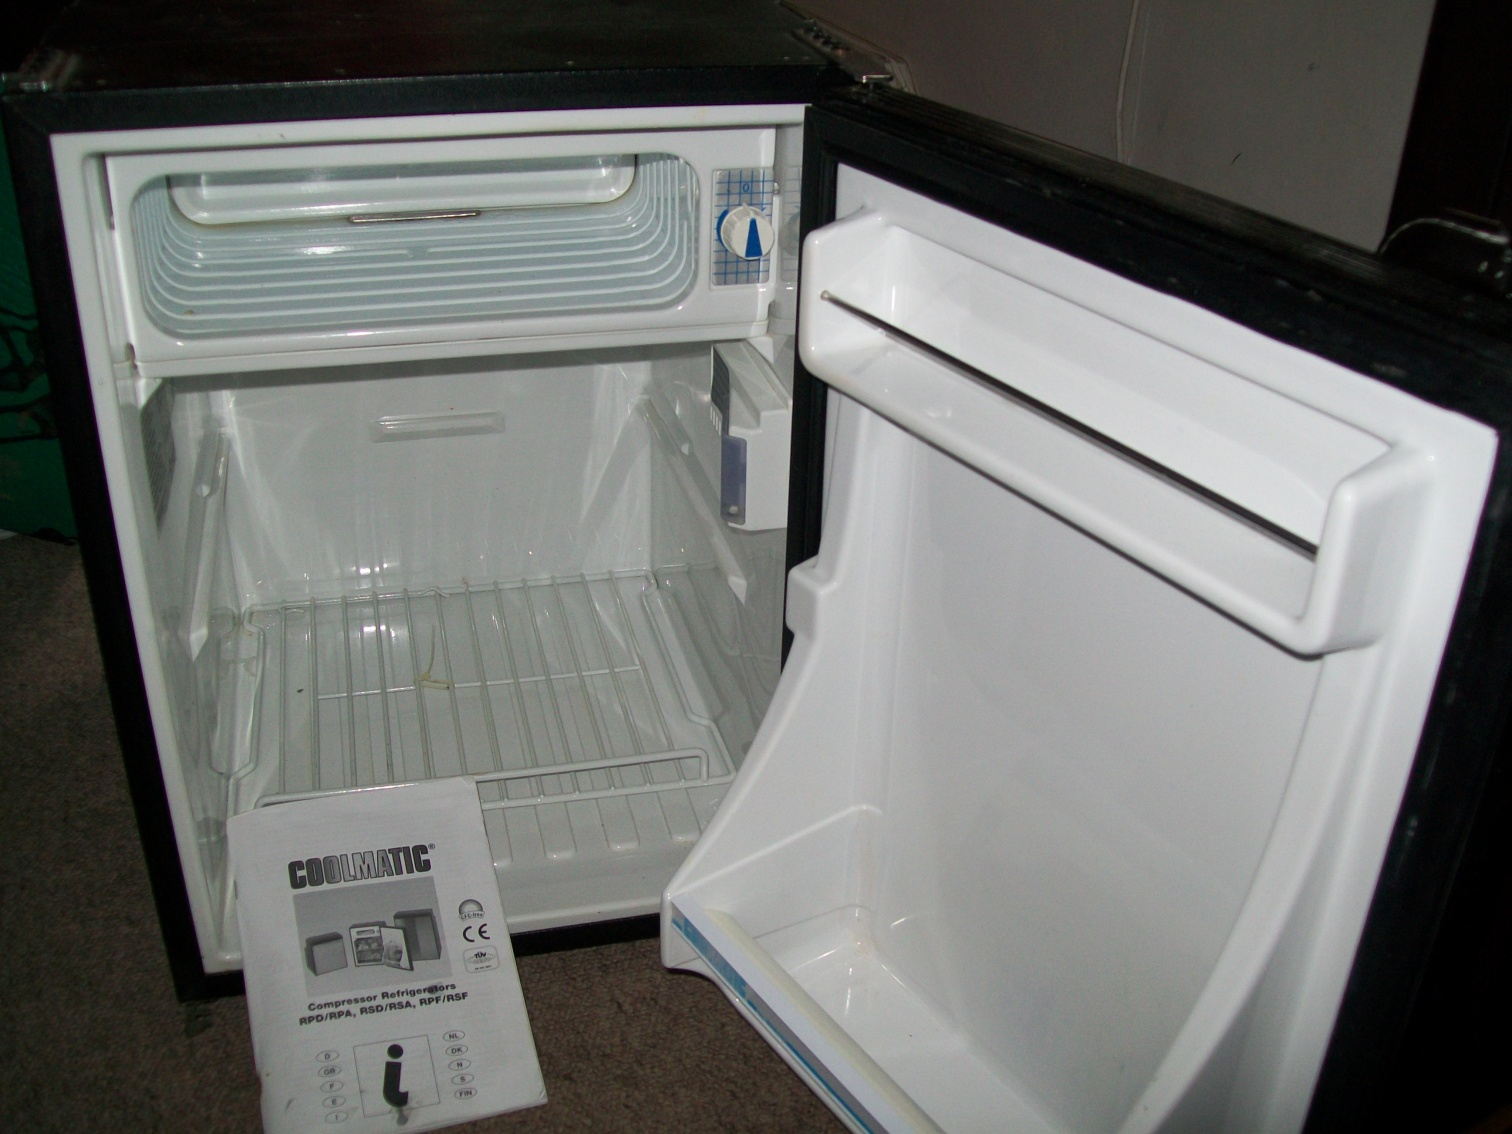 Click image for larger version  Name:nav fridge 007.jpg Views:171 Size:404.3 KB ID:47272